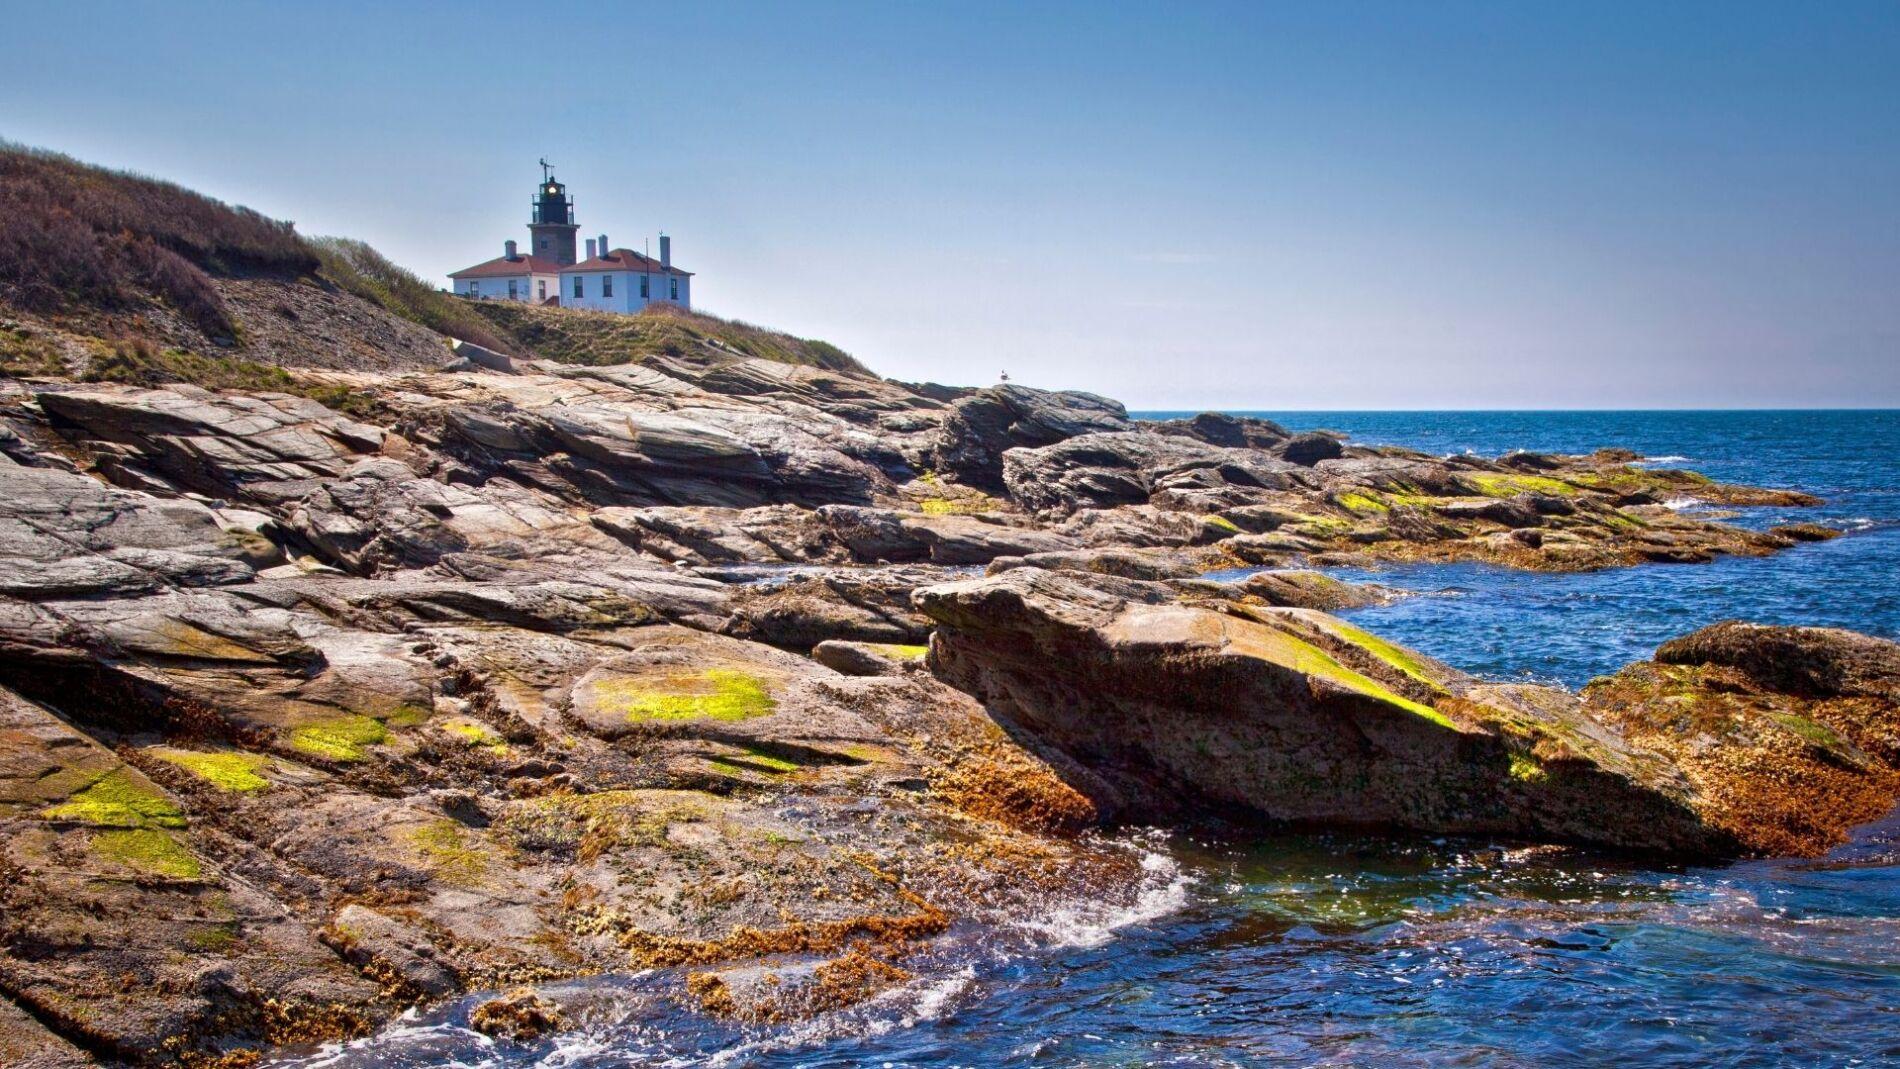 Beautiful Beavertail lighthouse in Narragnasett